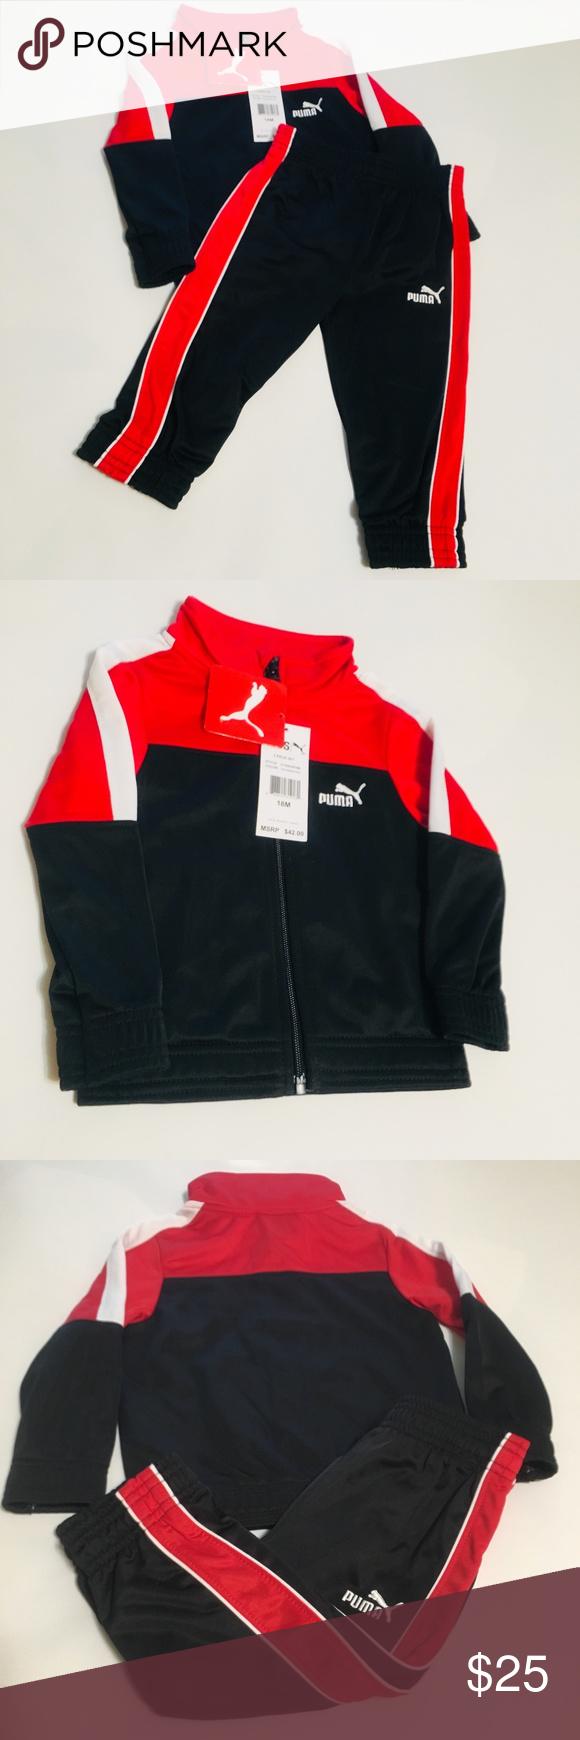 ea6d58a9e910 Puma Infant Boys Jacket   Pant Warm Up Set Puma Infant Boys Black   Red  Jacket